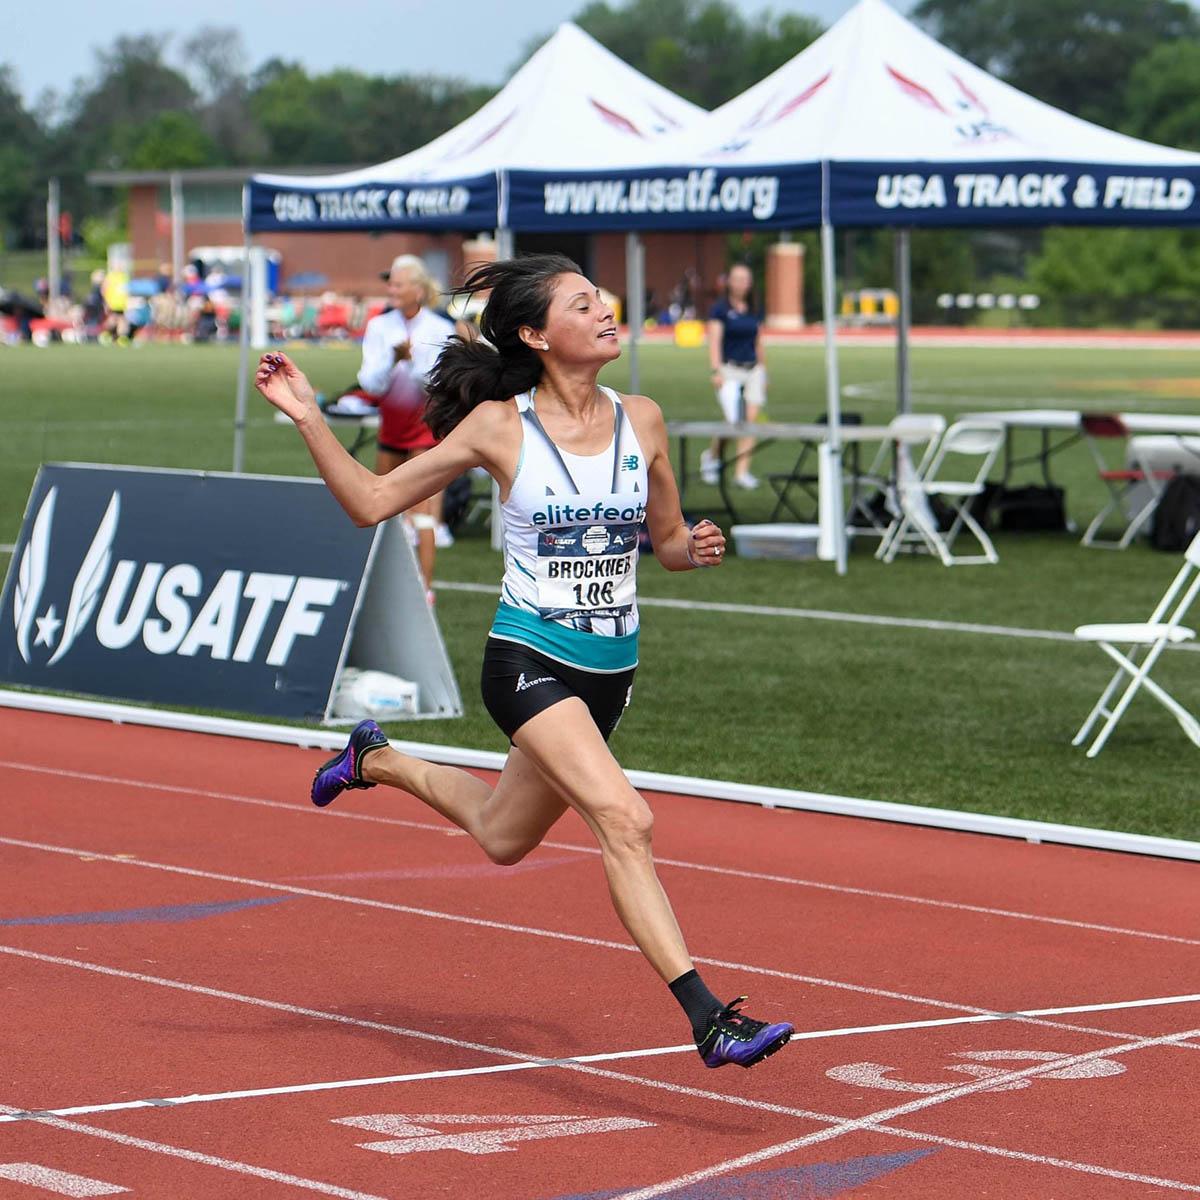 SBU Track Star Triumphs at USATF Masters Athletics Championships